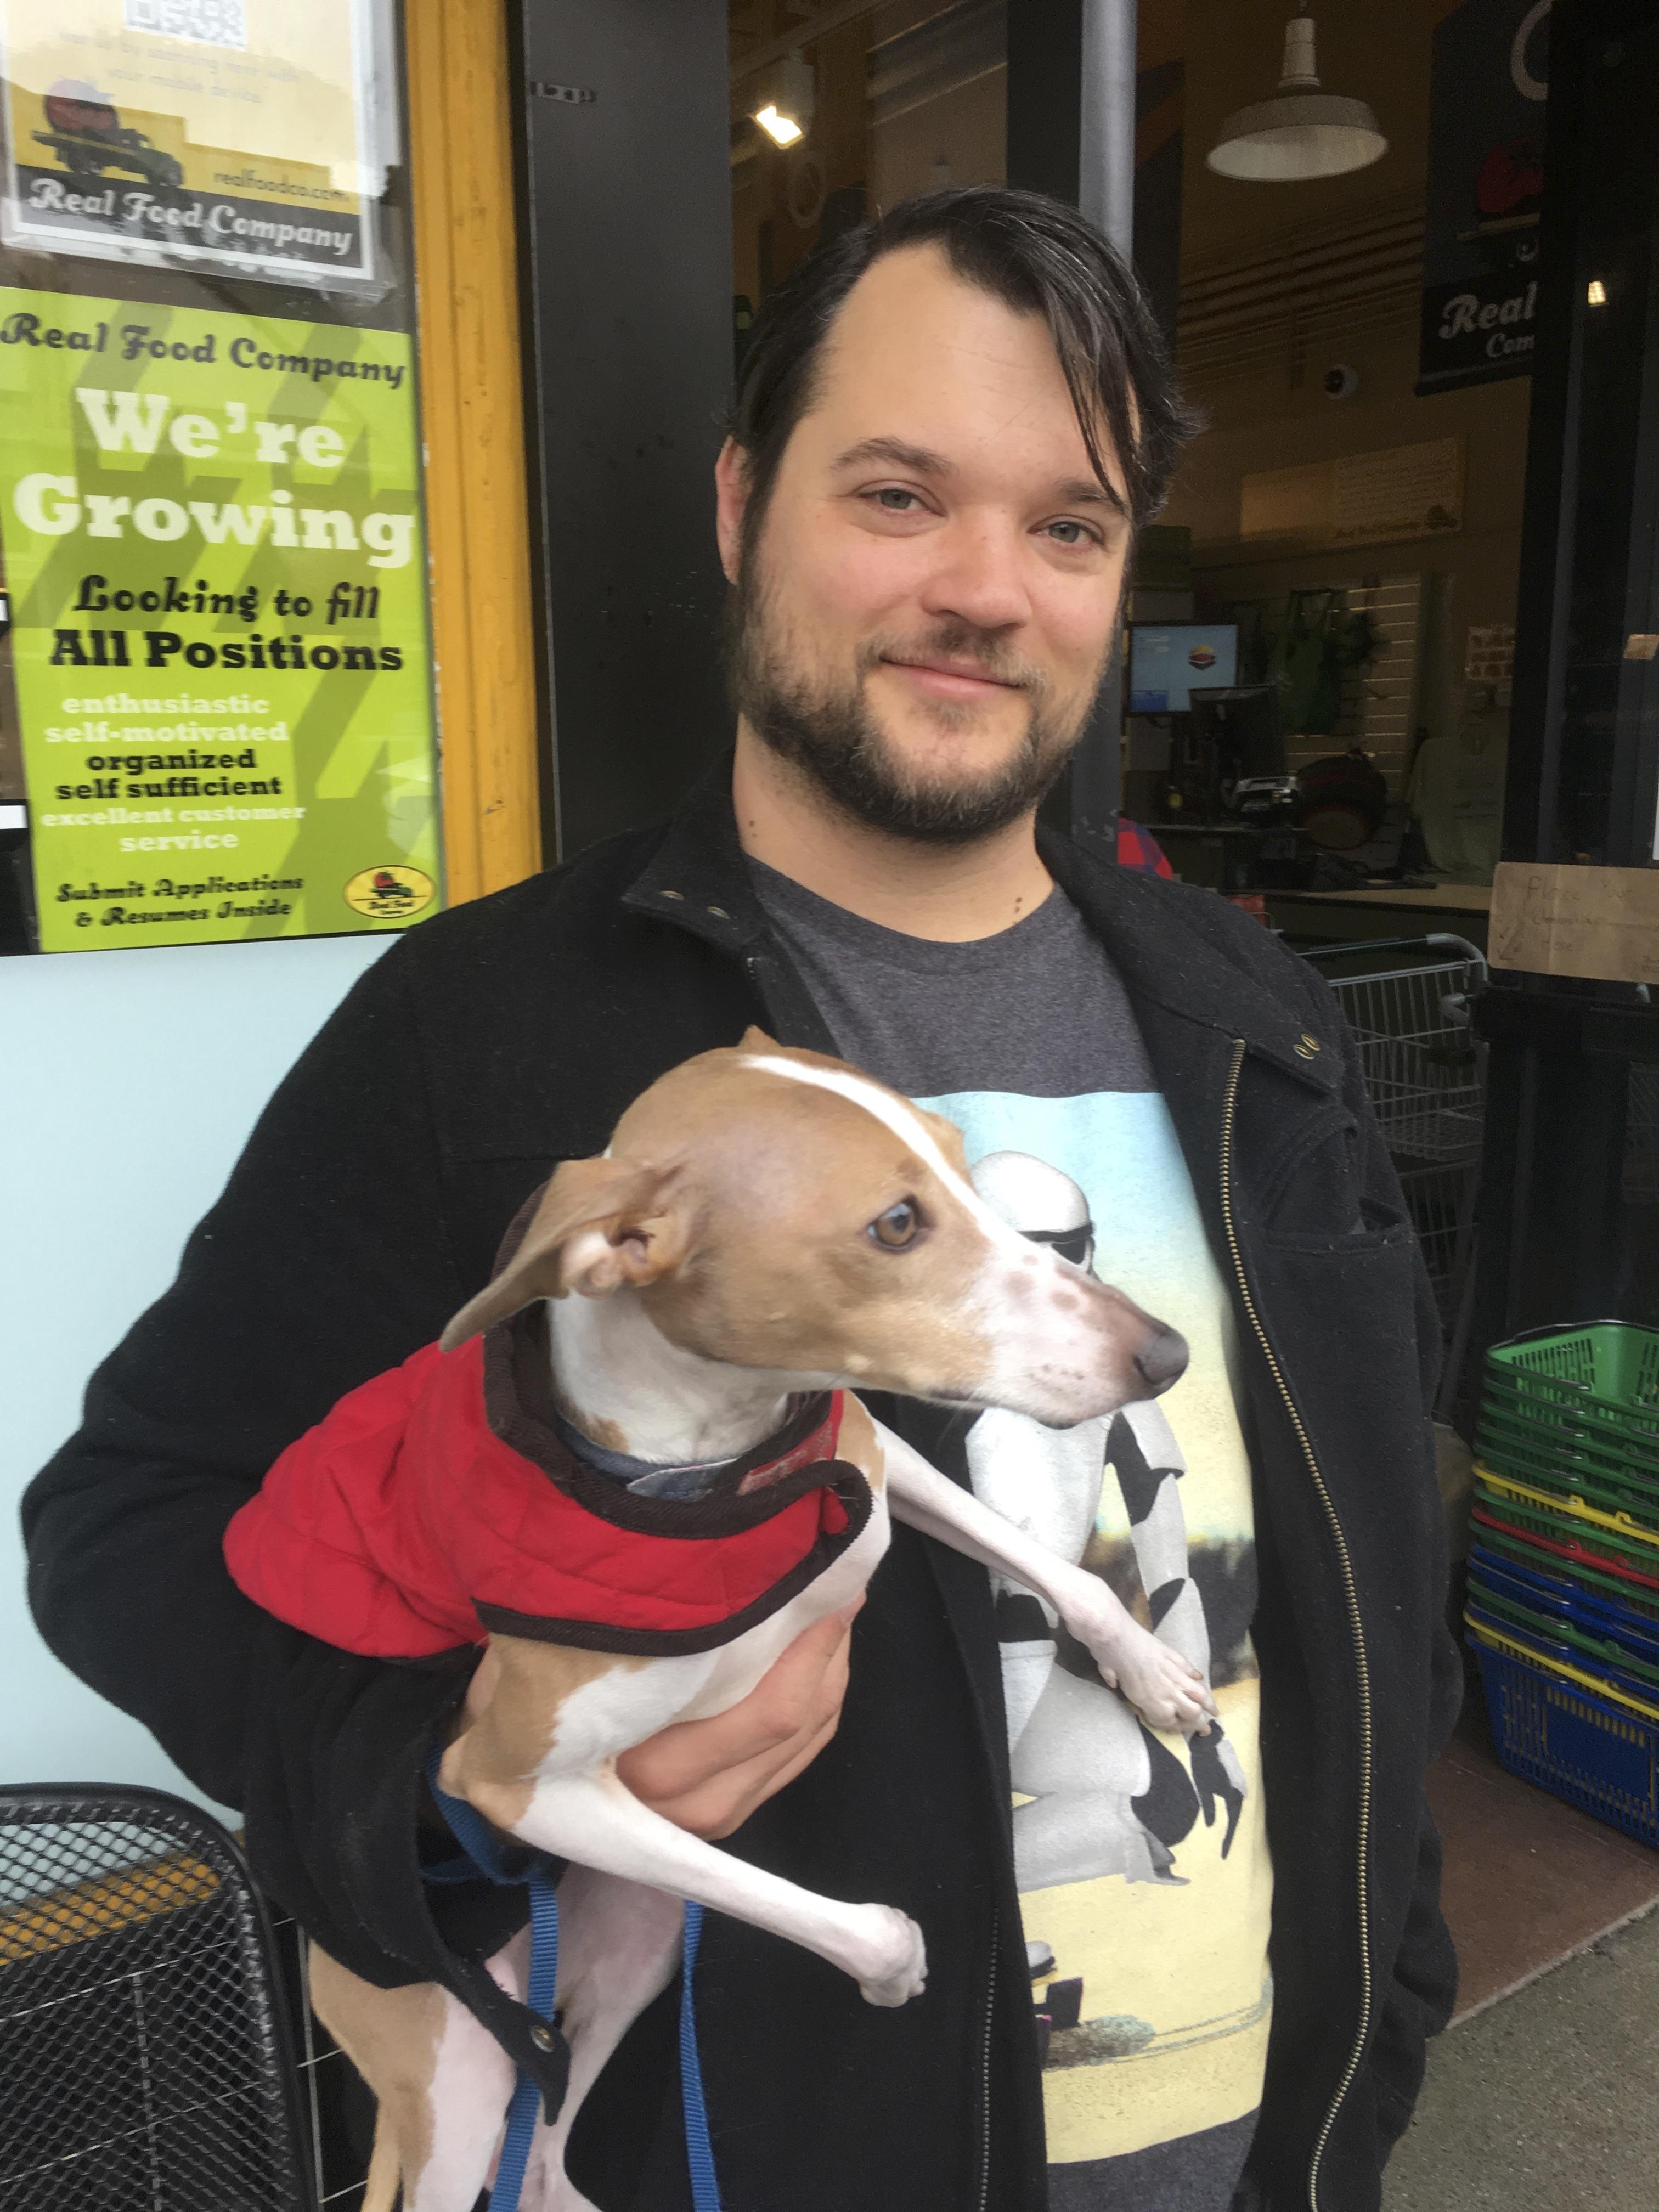 Man Holding Italian Greyhound